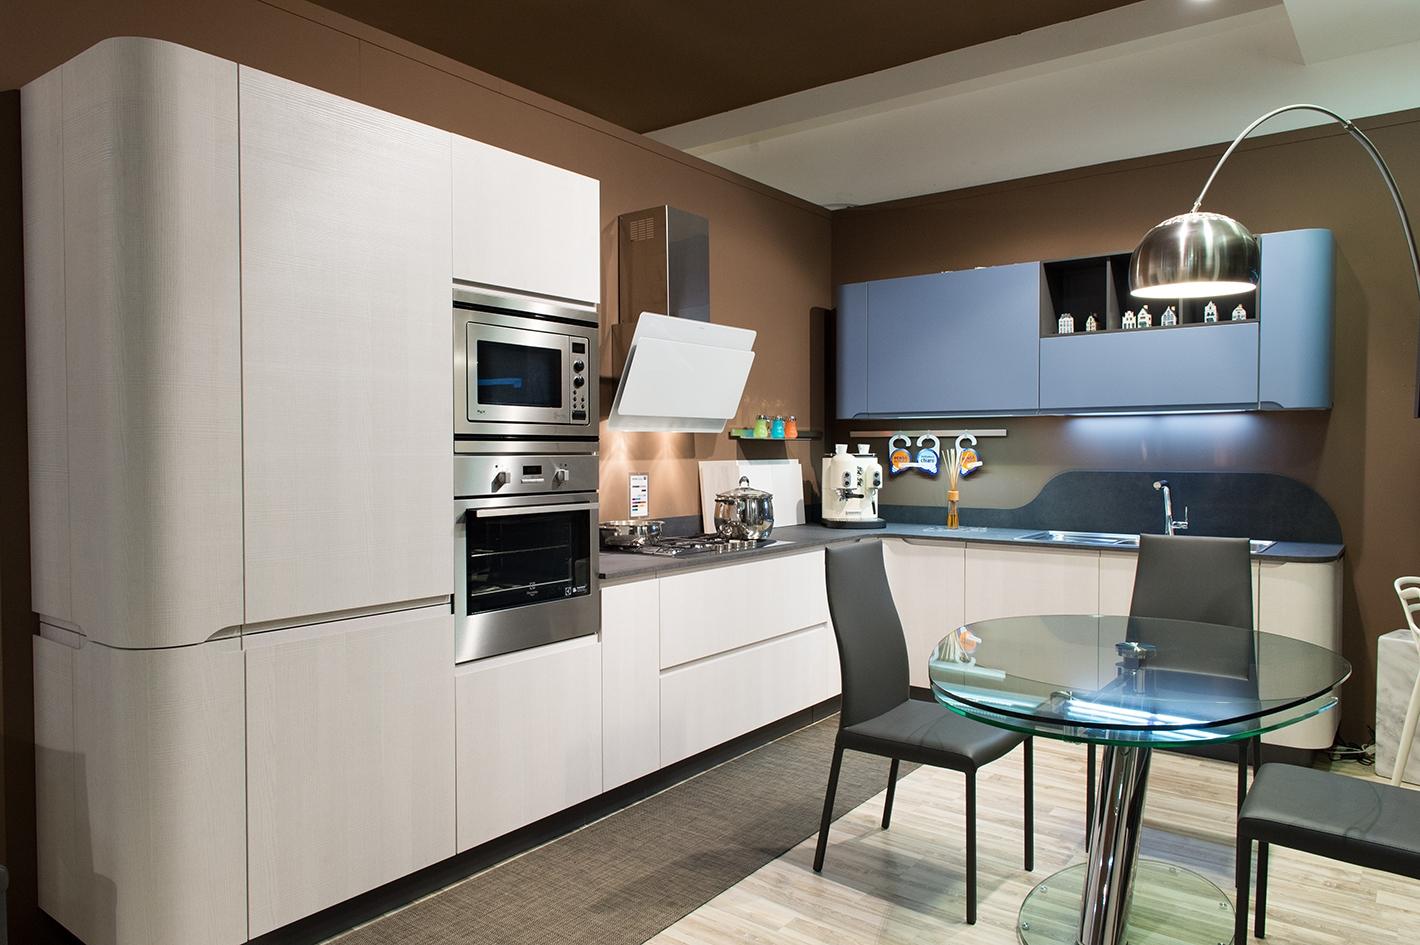 Awesome Cucina Stosa Modello Maxim Ideas - Home Ideas - tyger.us